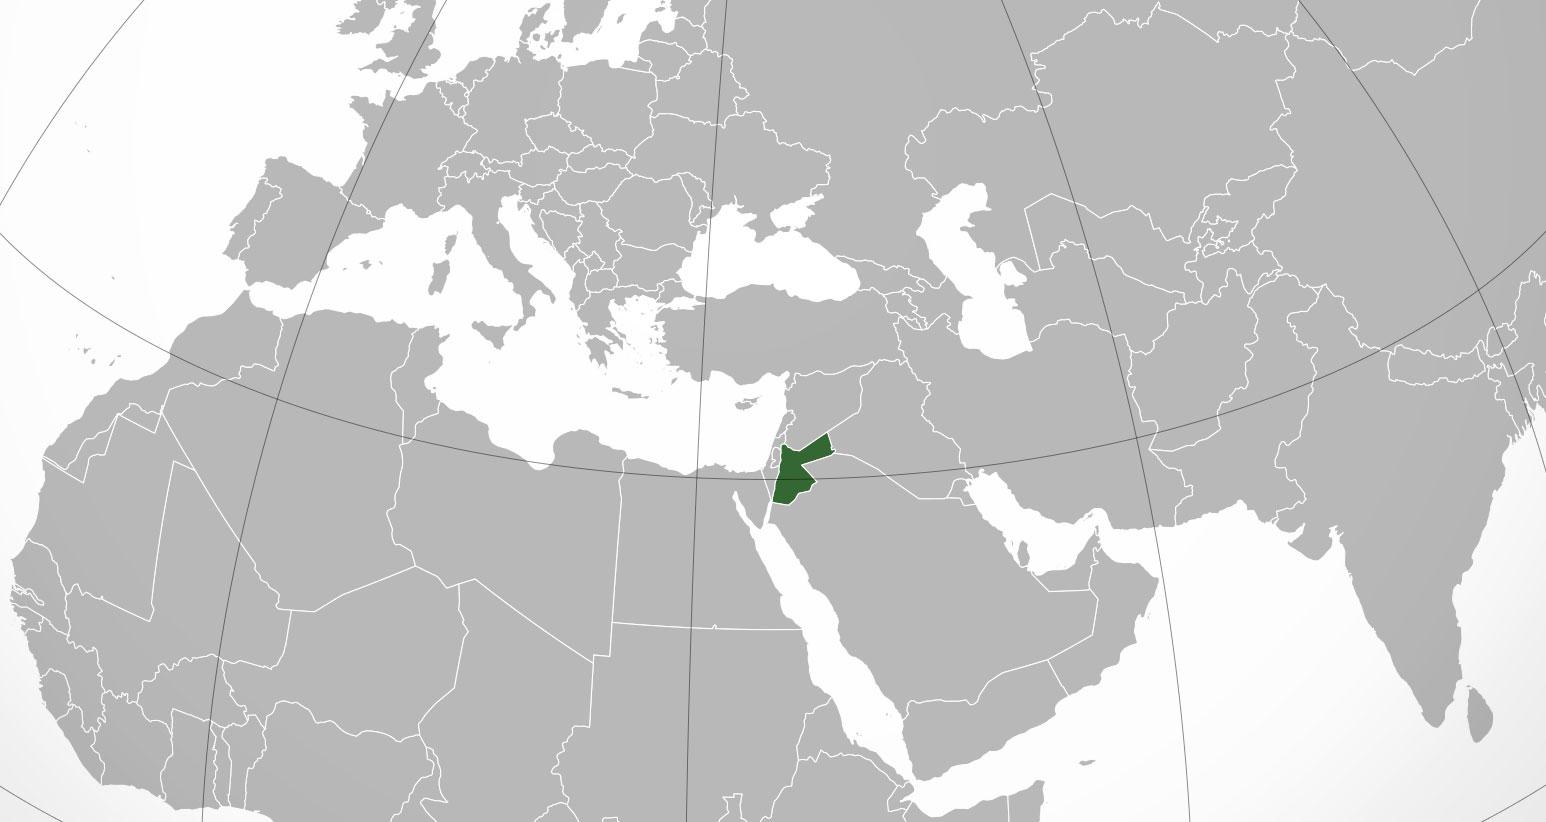 jordania mapa Mapa de Jordania, donde está, queda, país, encuentra  jordania mapa